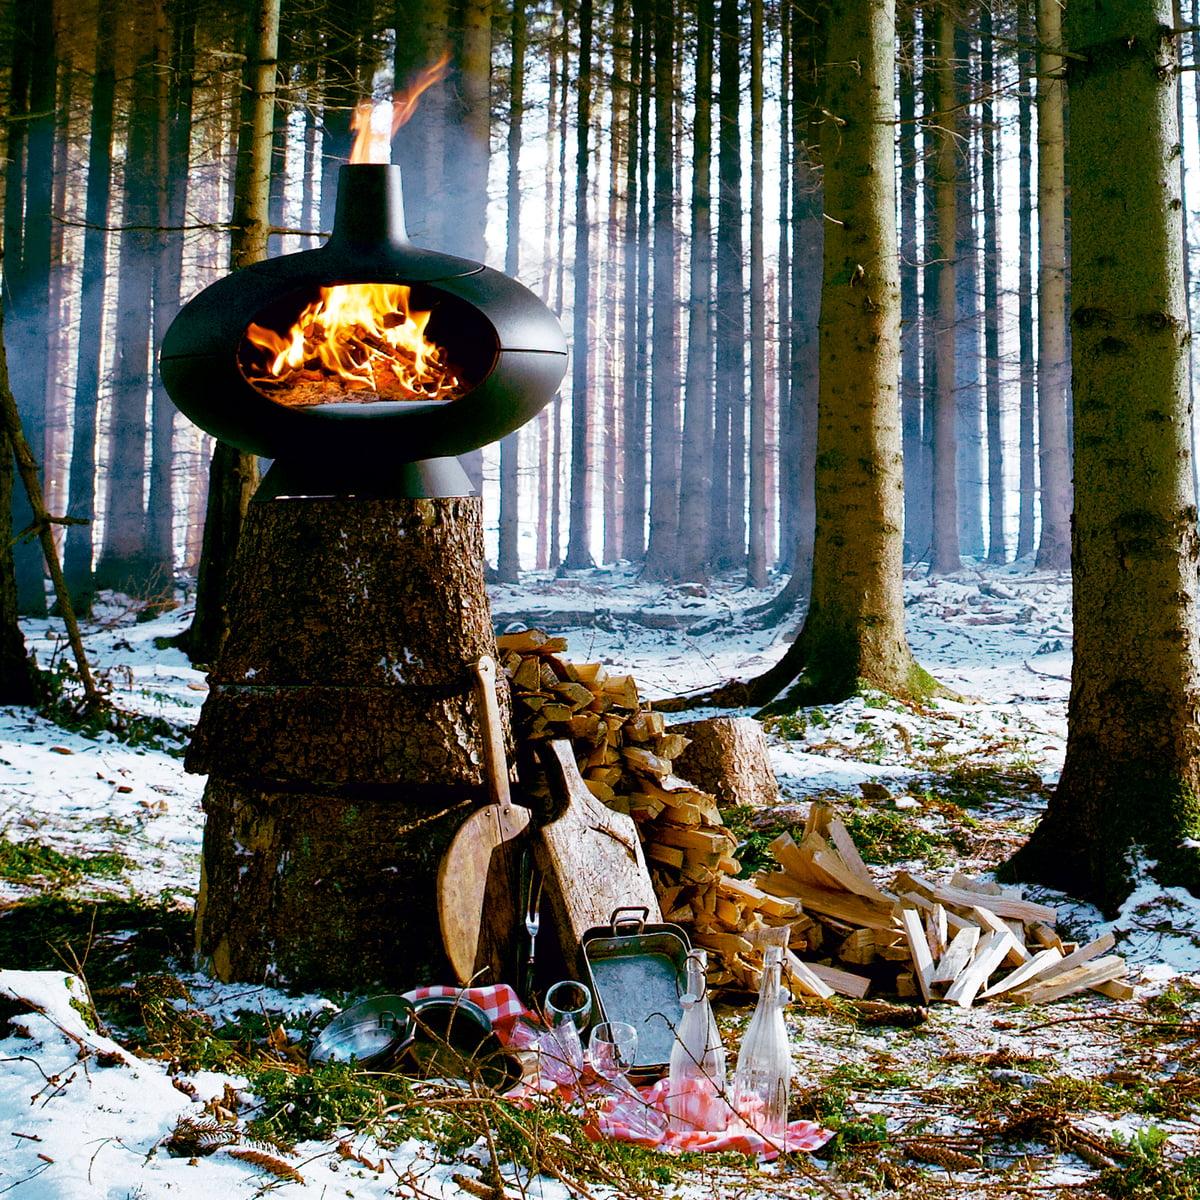 Poele A Bois Morso Avis morsø - barbecue et four forno, noir